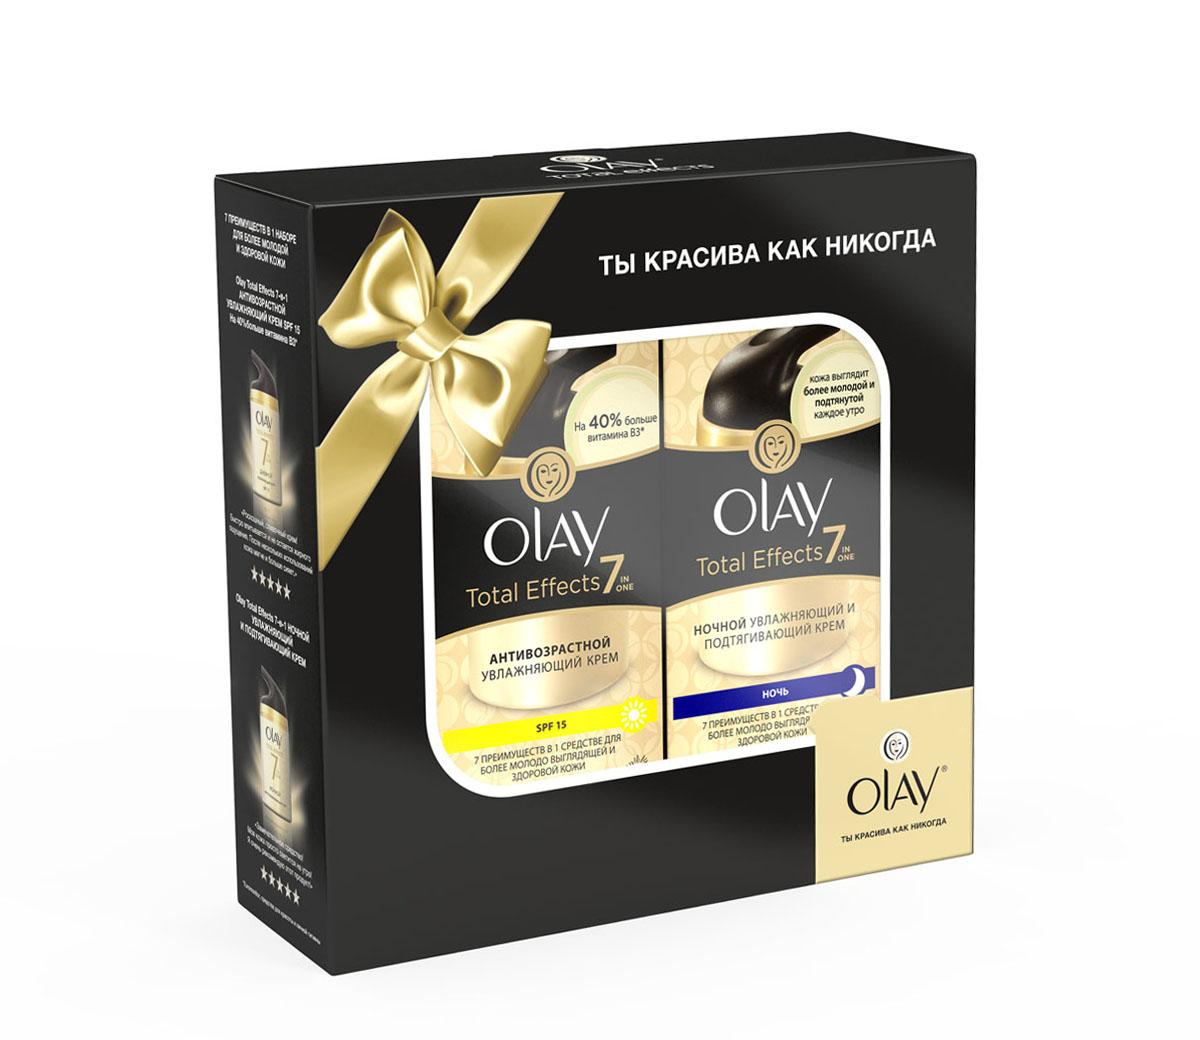 Olay Total Effects Подарочный набор антивозрастной увлажняющий крем SPF-15 (50 мл) + Olay Total Effects ночной увлажняющий и подтягивающий крем (50 мл)